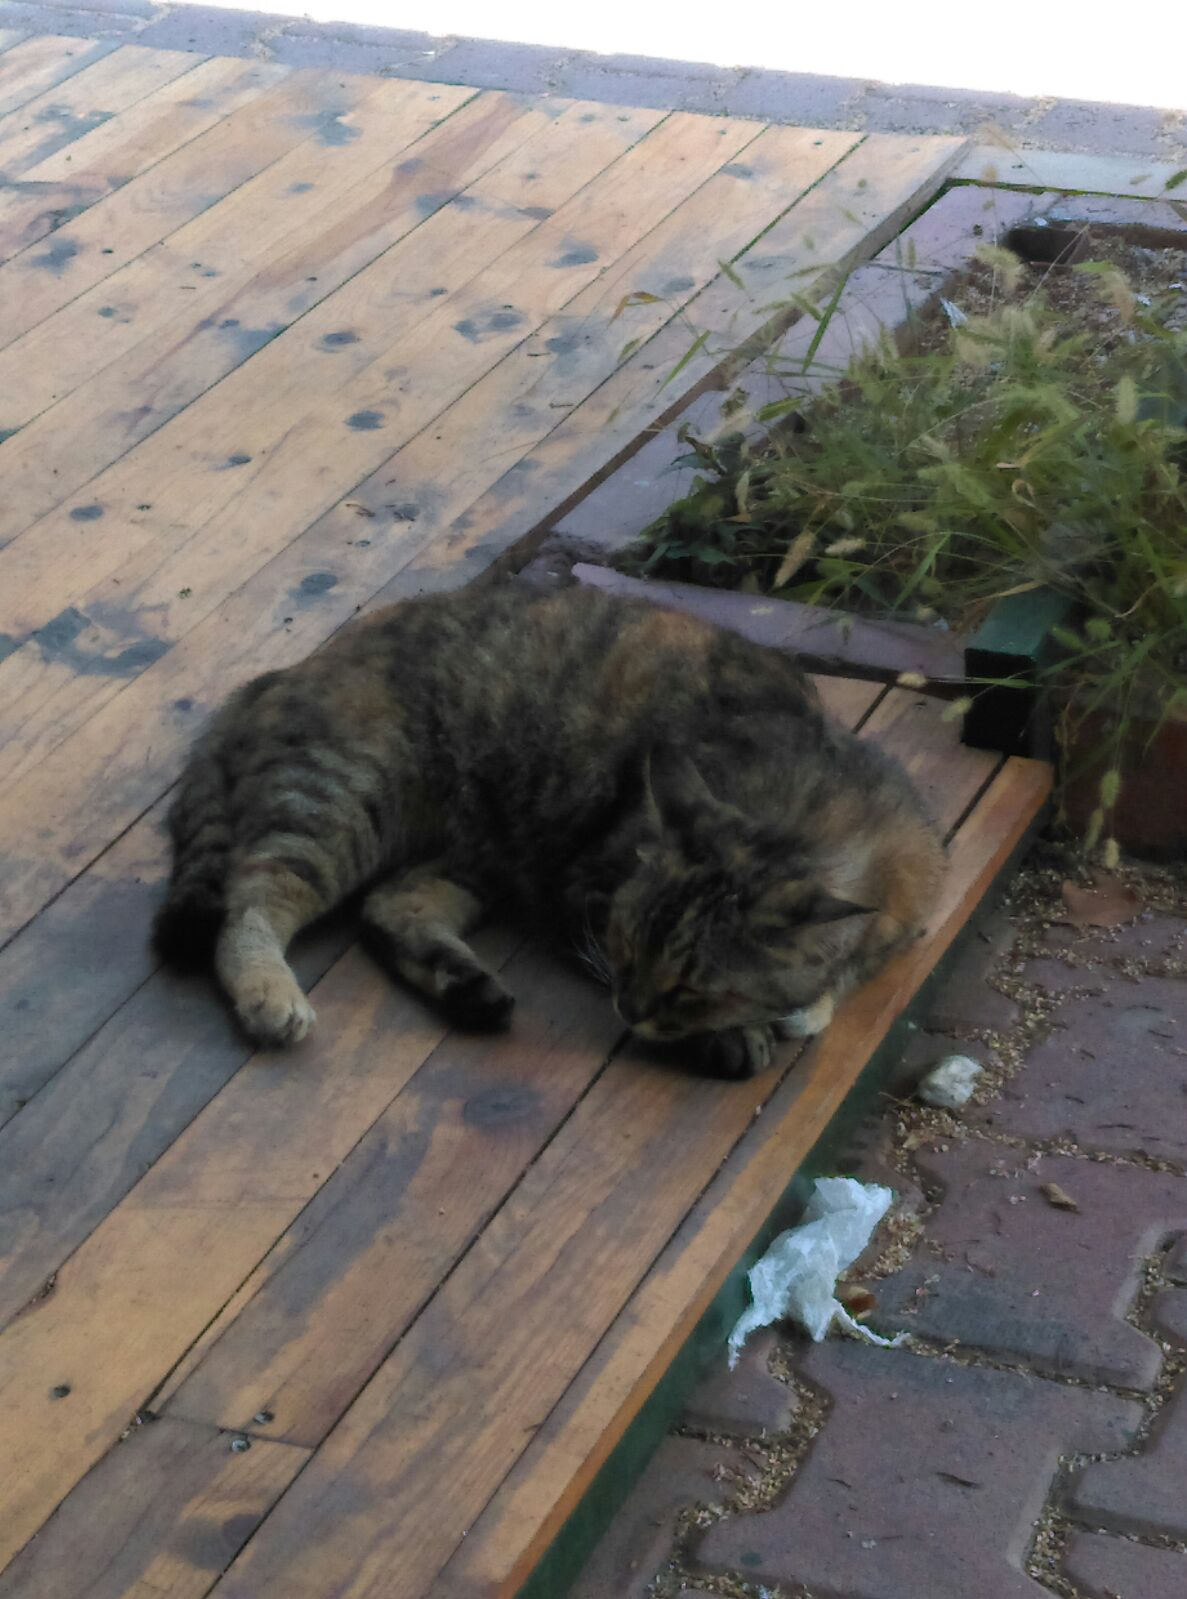 ev kedisi sokağa atılmış. acil yuva arıyoruz.